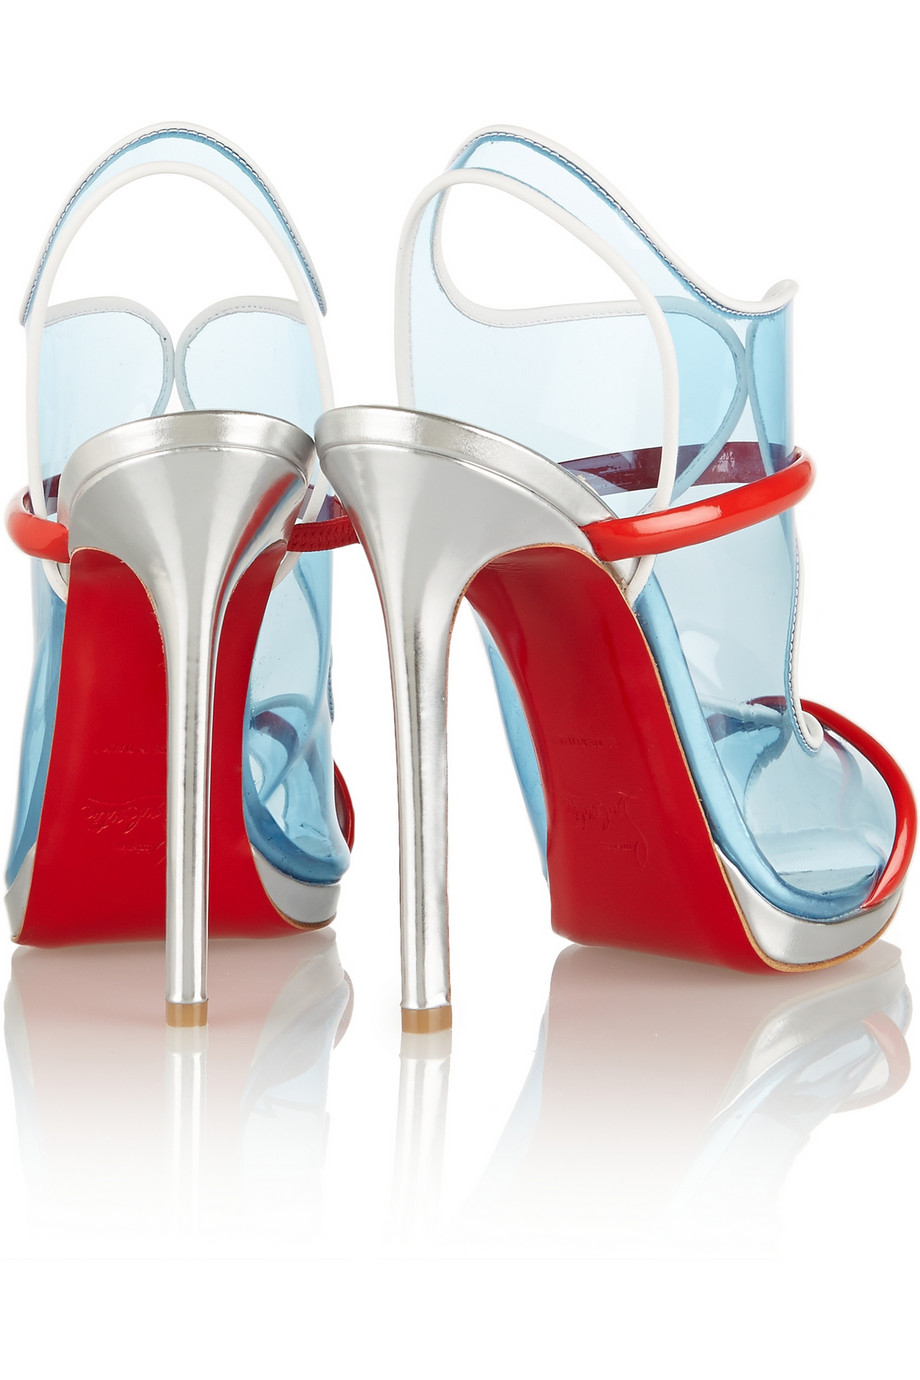 blue christian louboutin sneakers - Artesur ? christian louboutin leather and patent leather sandals ...